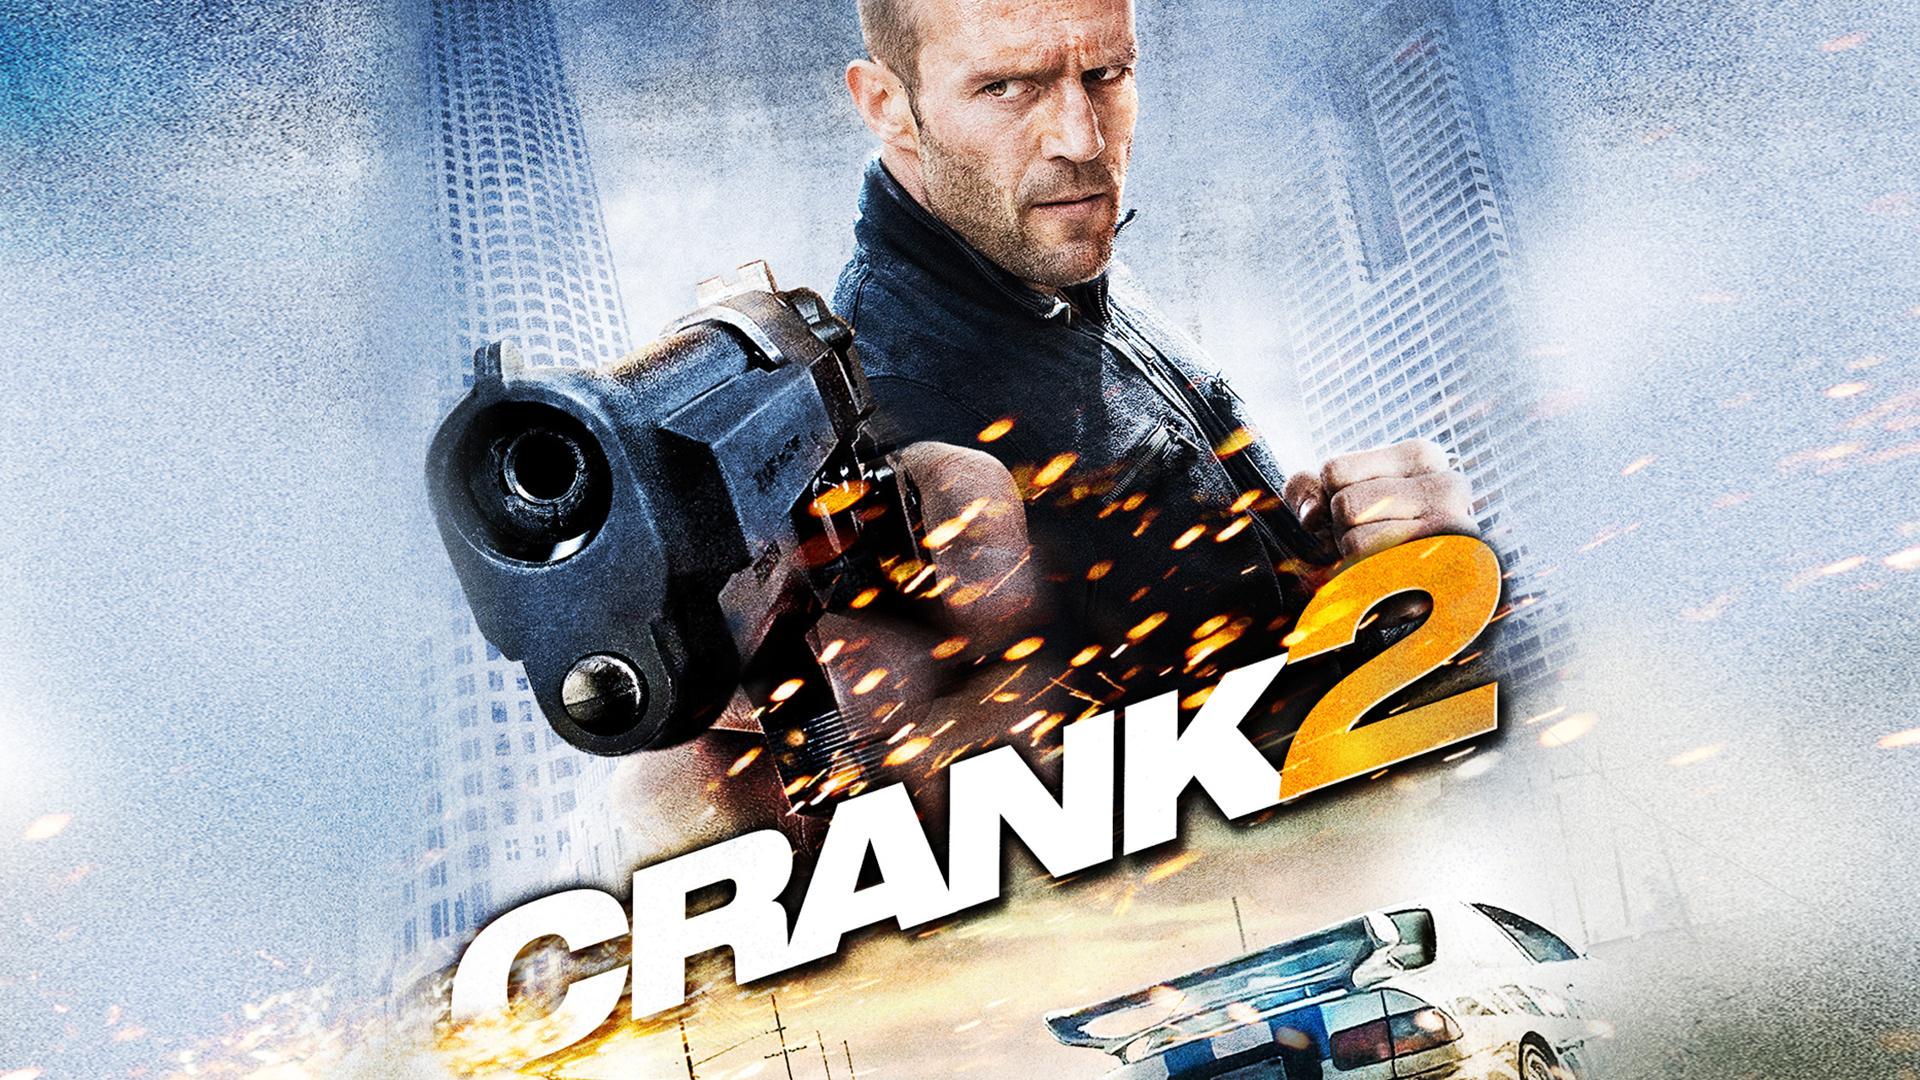 Crank 2: High Voltage